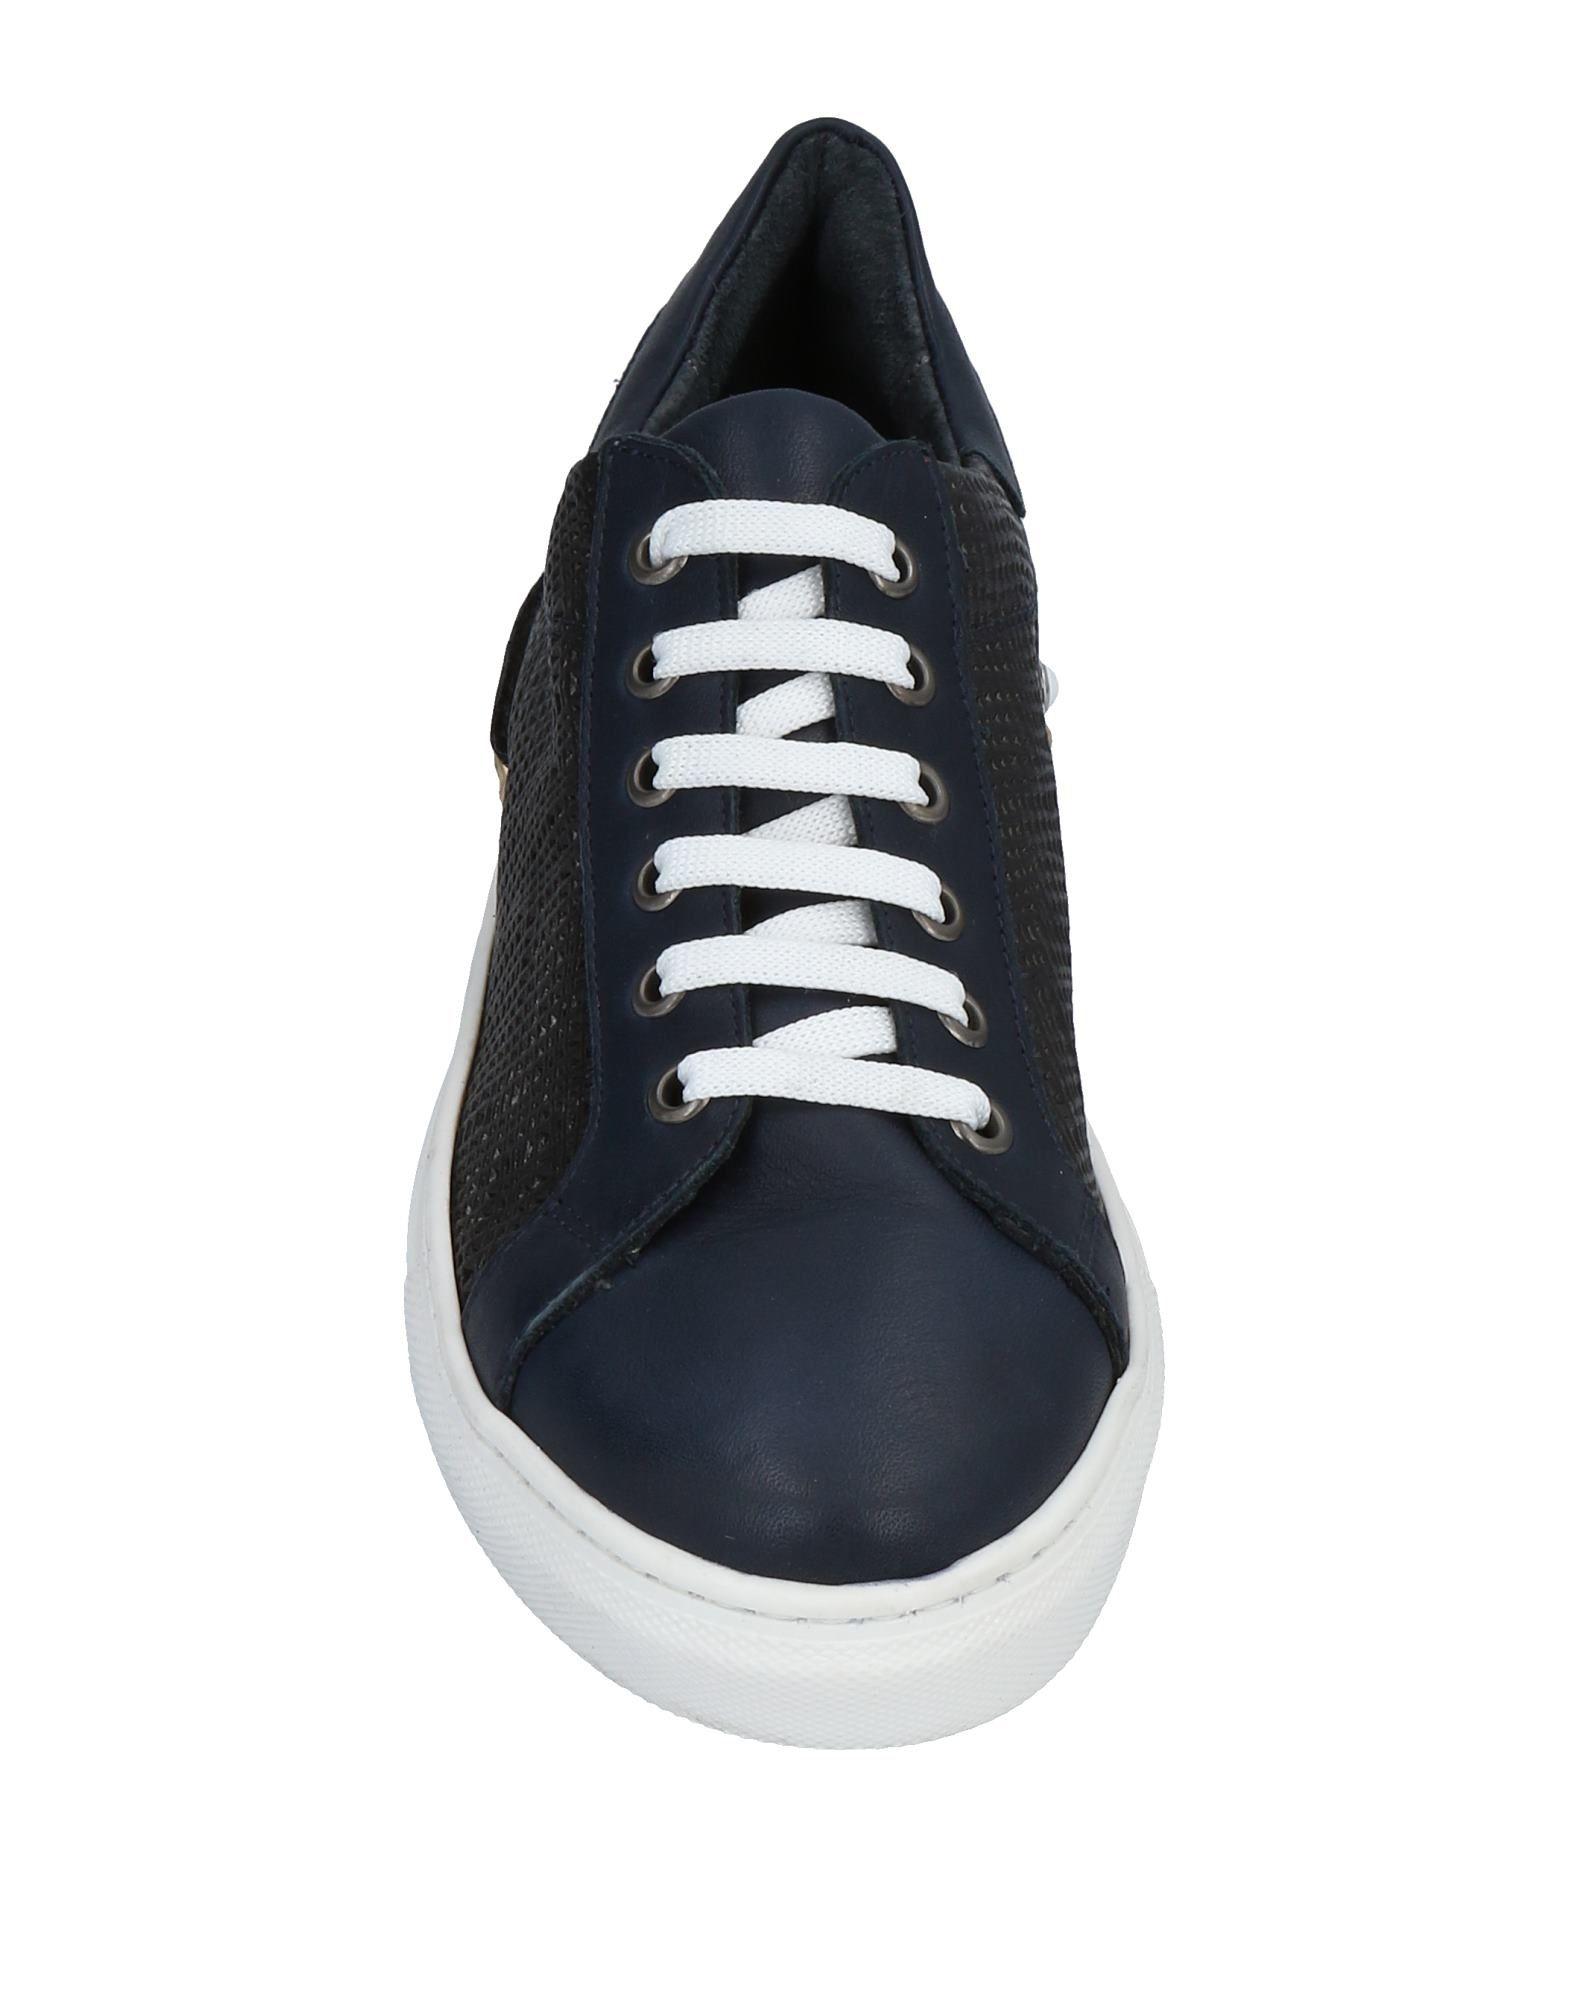 Piampiani 11491486KO Sneakers Damen  11491486KO Piampiani Gute Qualität beliebte Schuhe 395d96